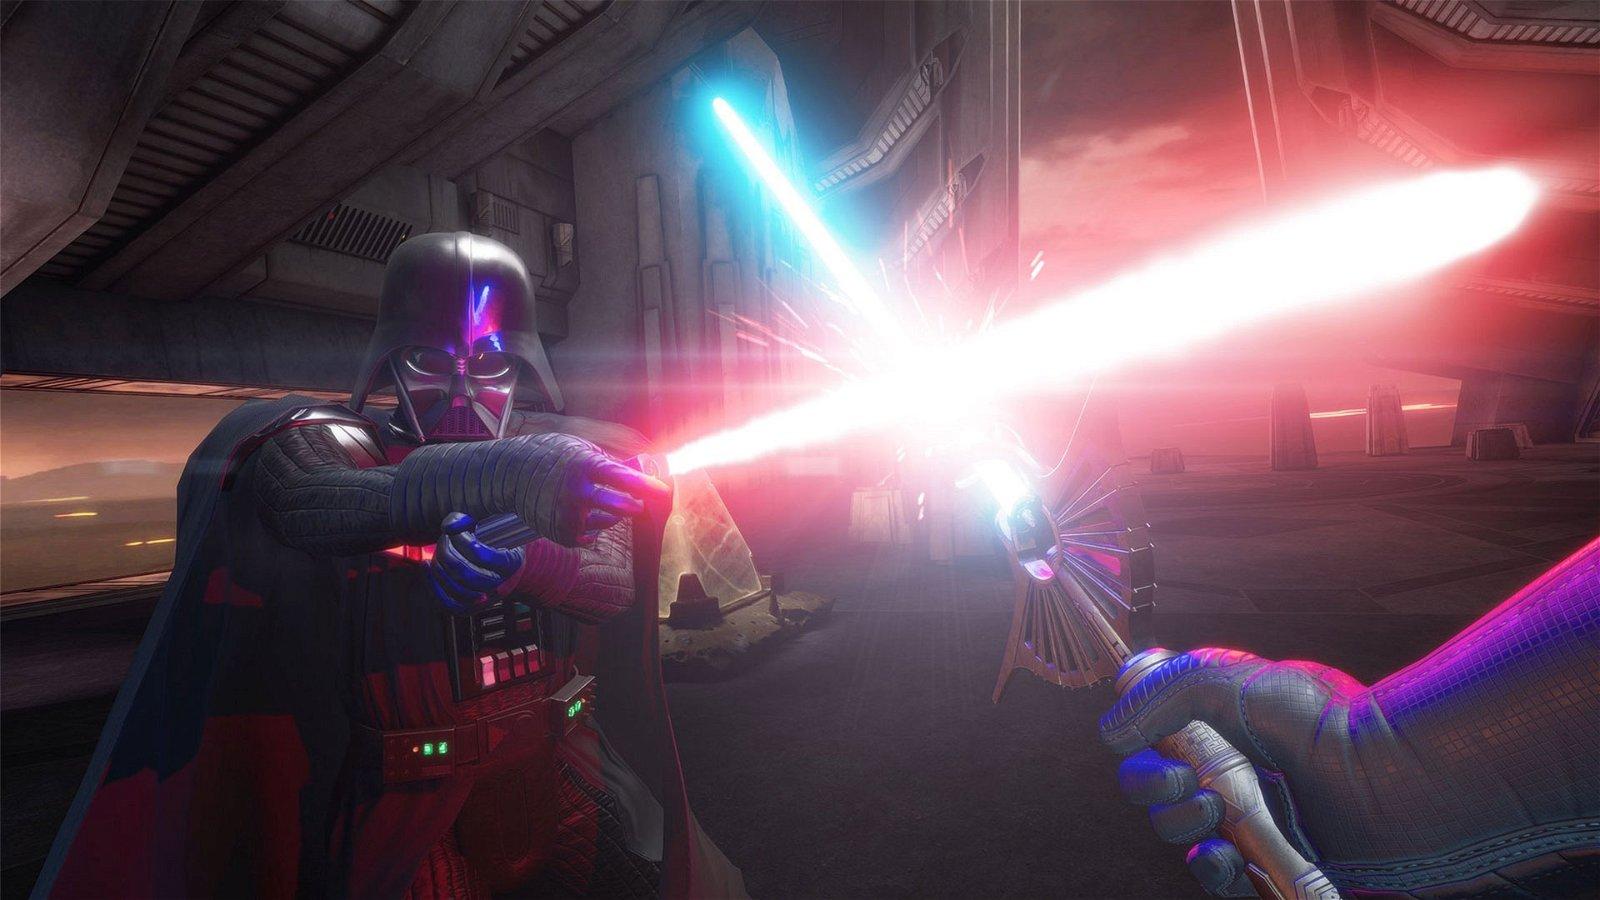 Vader Immortal Gets Special PSVR Physical Release 1